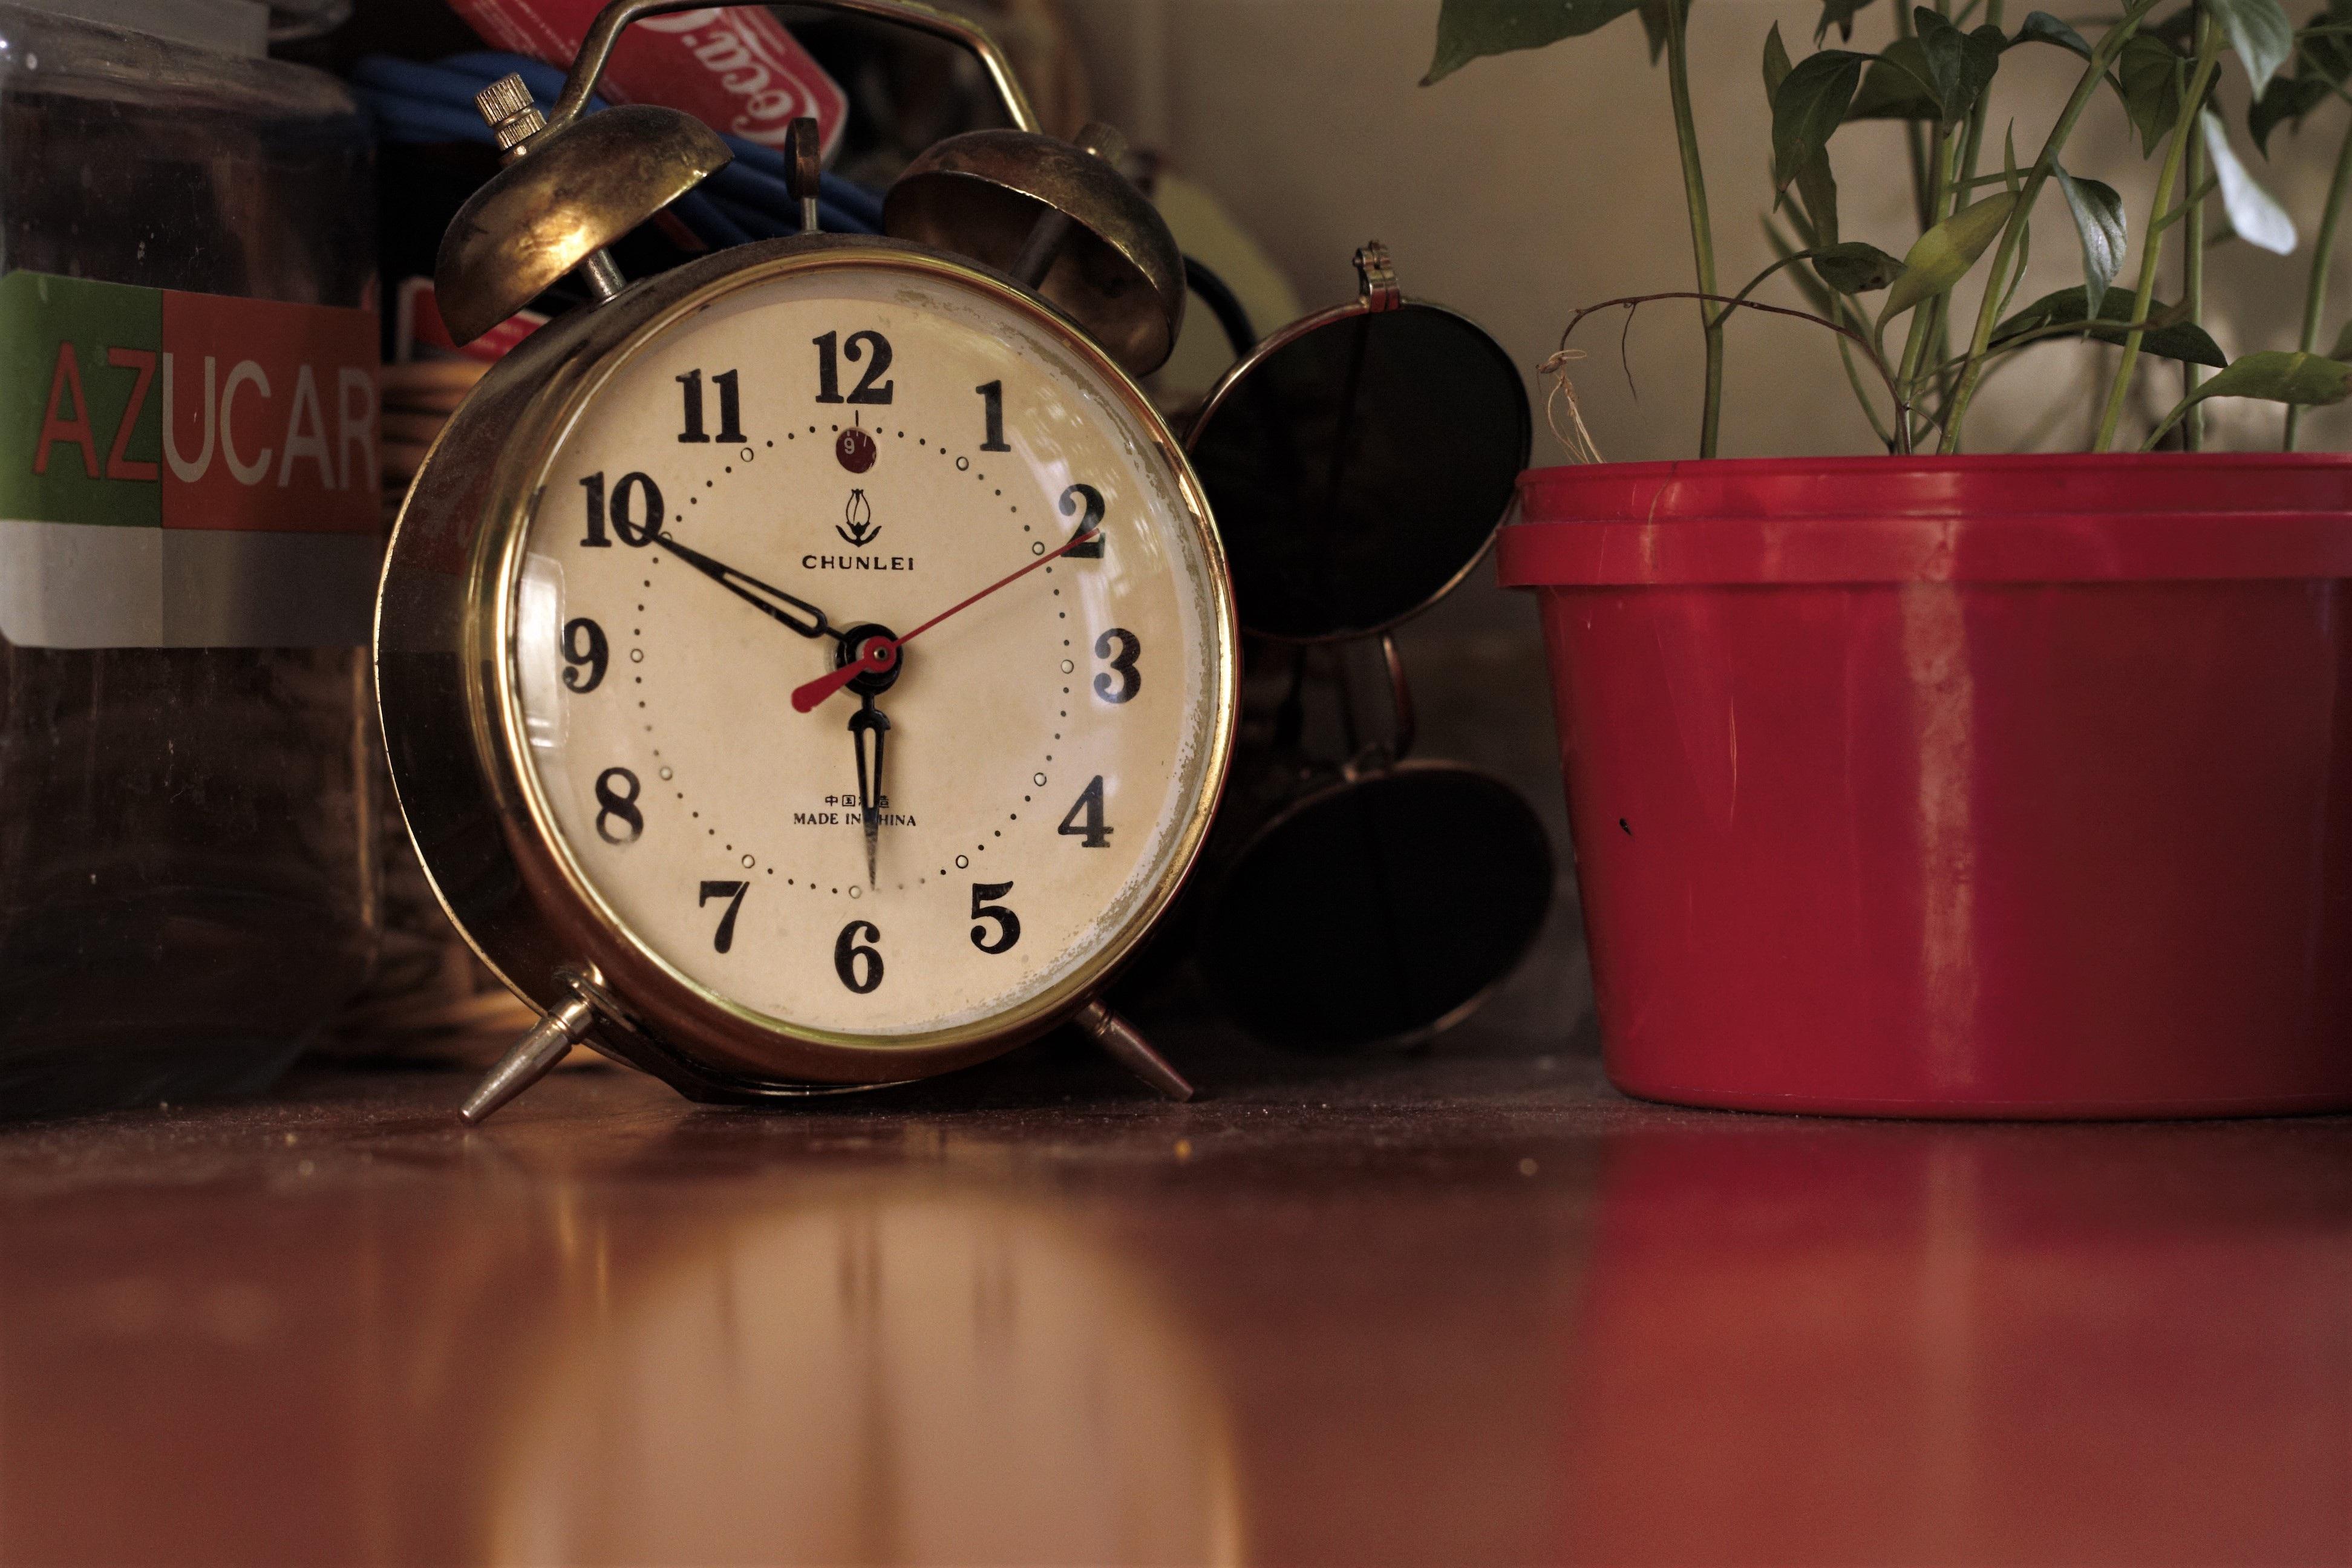 Fotos Gratis Reloj Mano Vendimia Retro Hora N Mero  # Muebles Num Decoracion